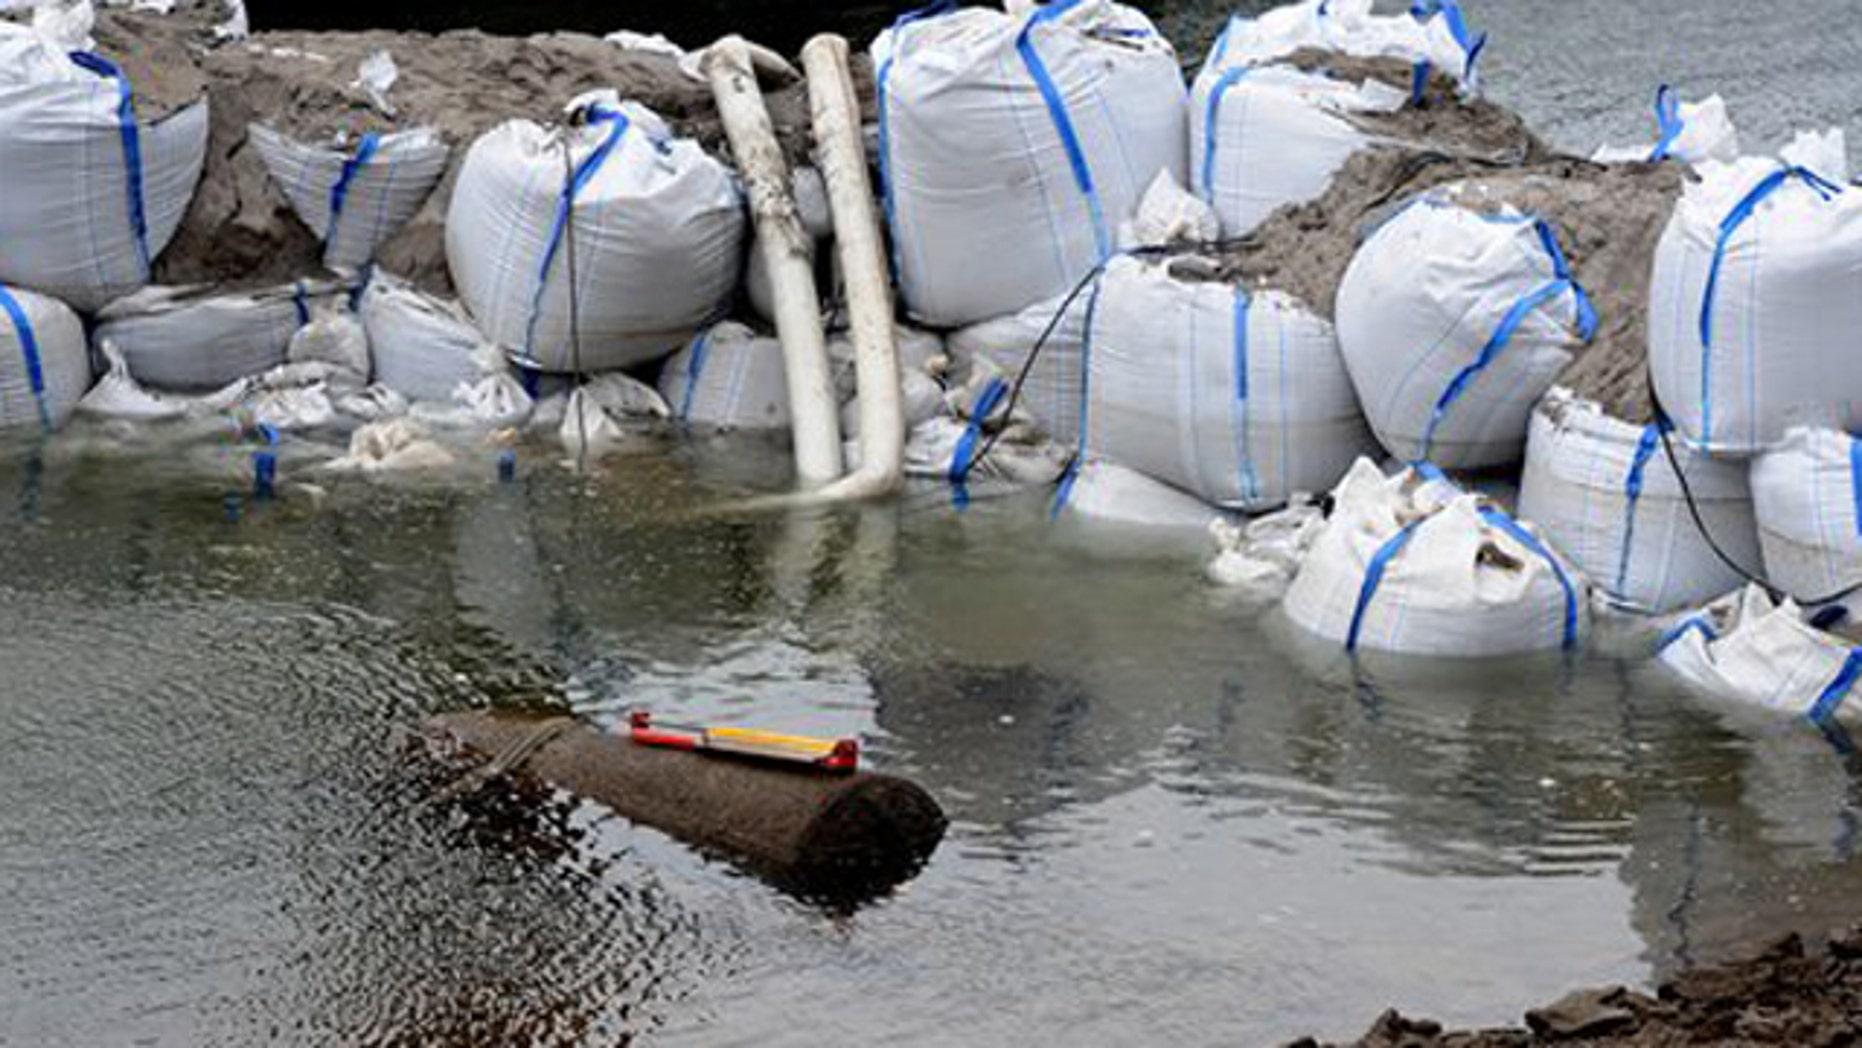 December 3, 2011: Sandbags frame a 1.8 ton WWII bomb  in river Rhine near Koblenz.